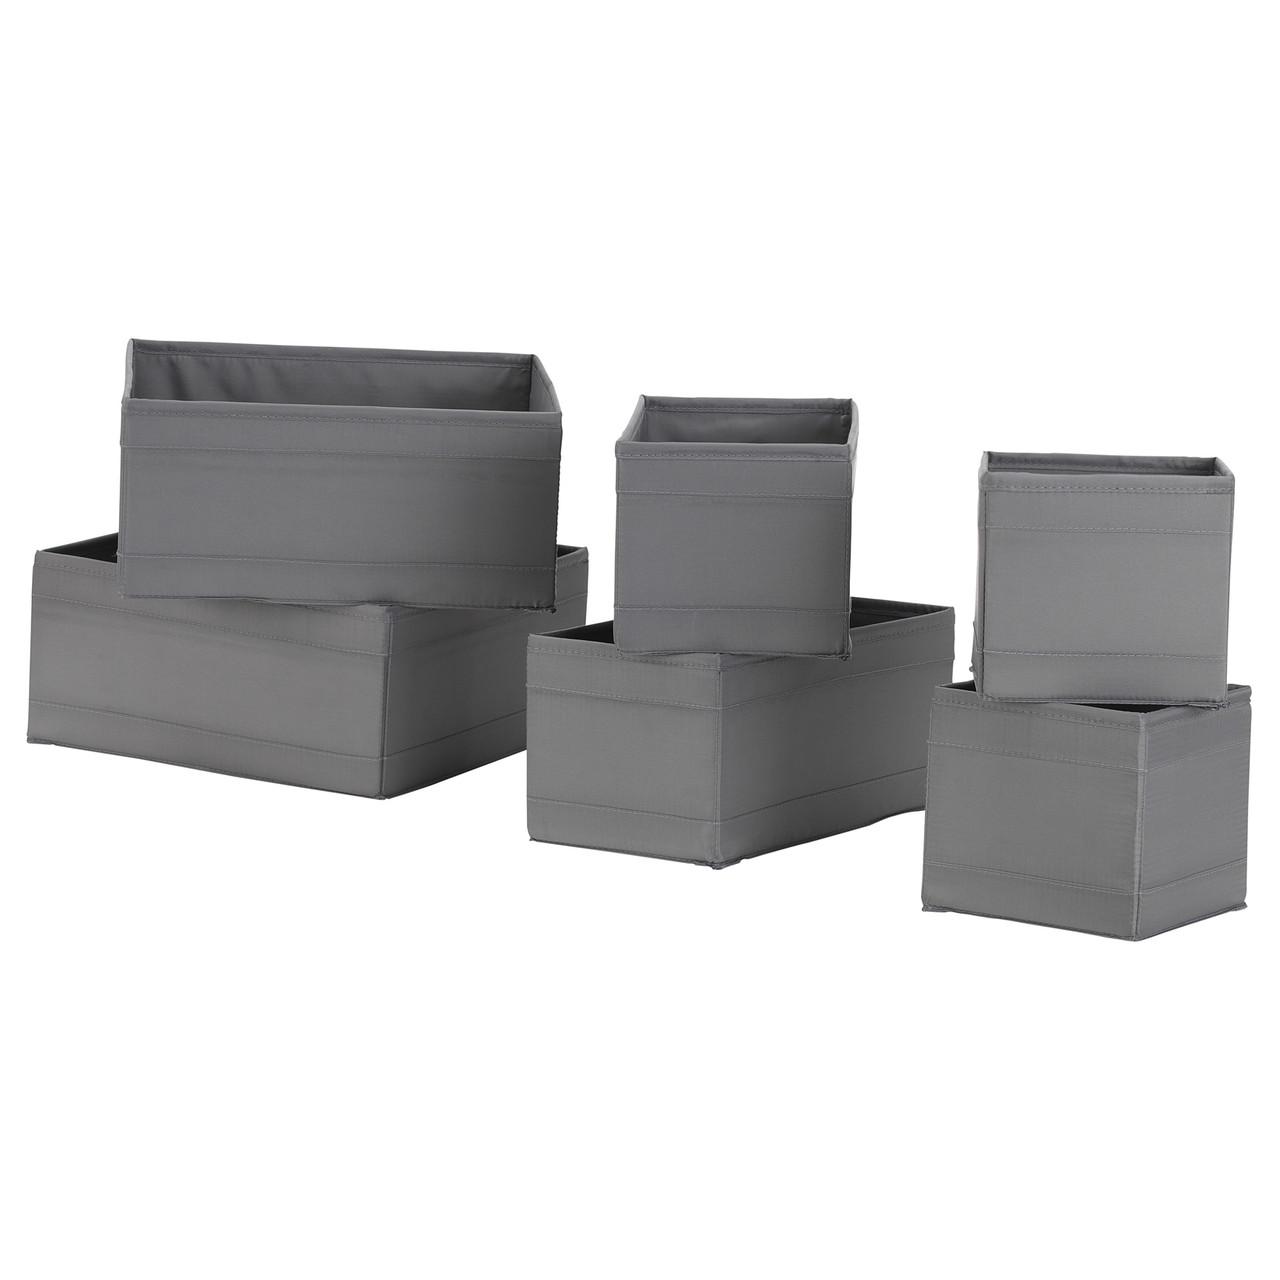 Набор коробок IKEA SKUBB 6 шт темно-серые 403.999.98